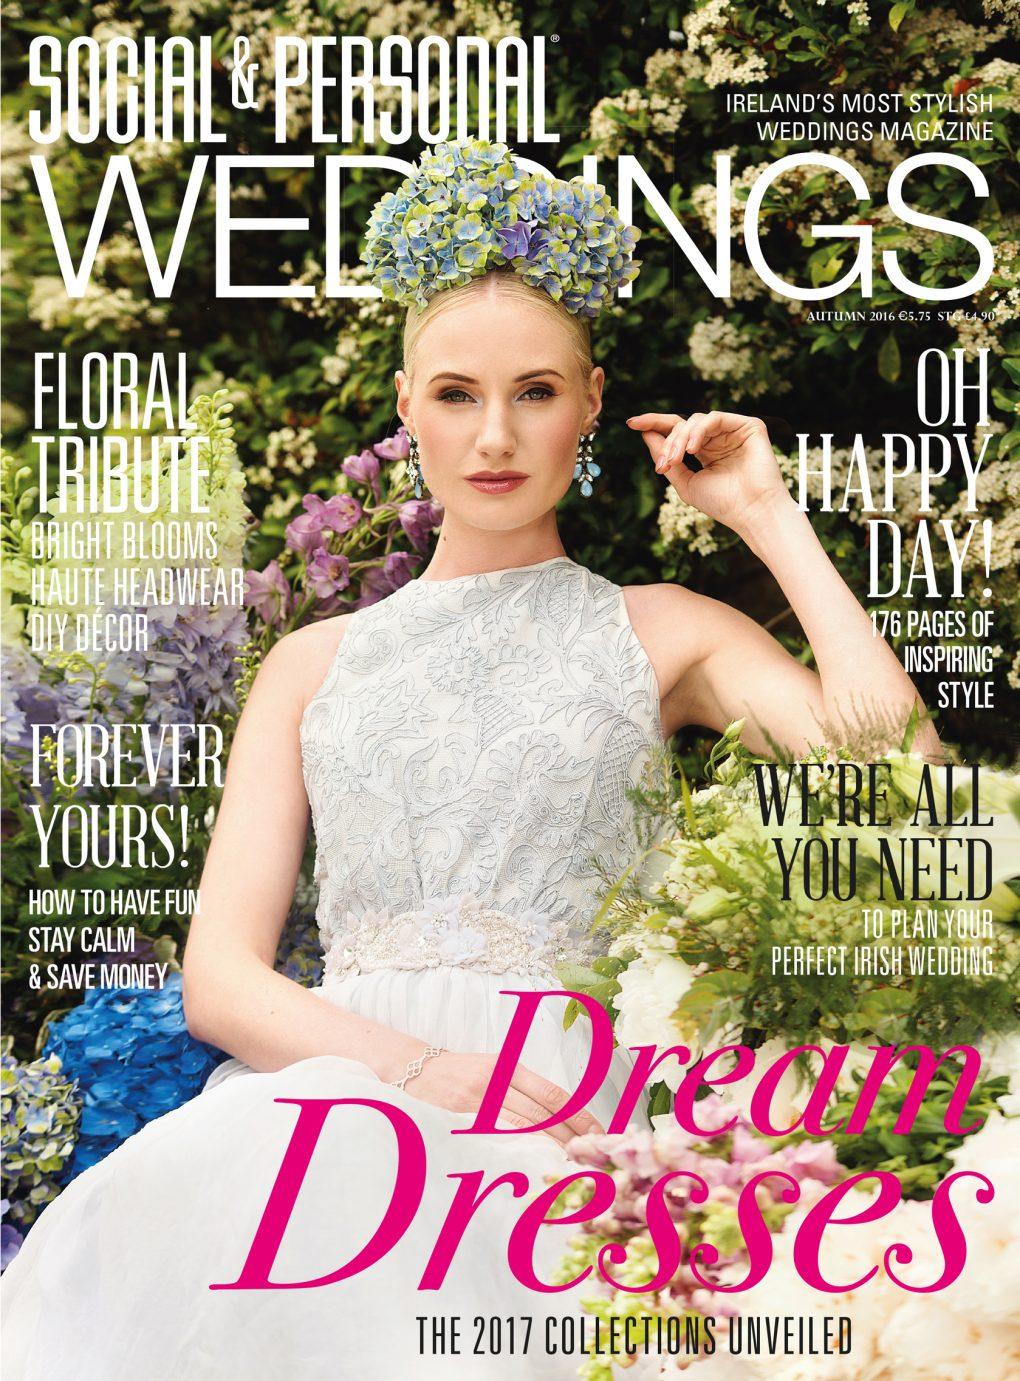 S&P Weddings Autumn cover